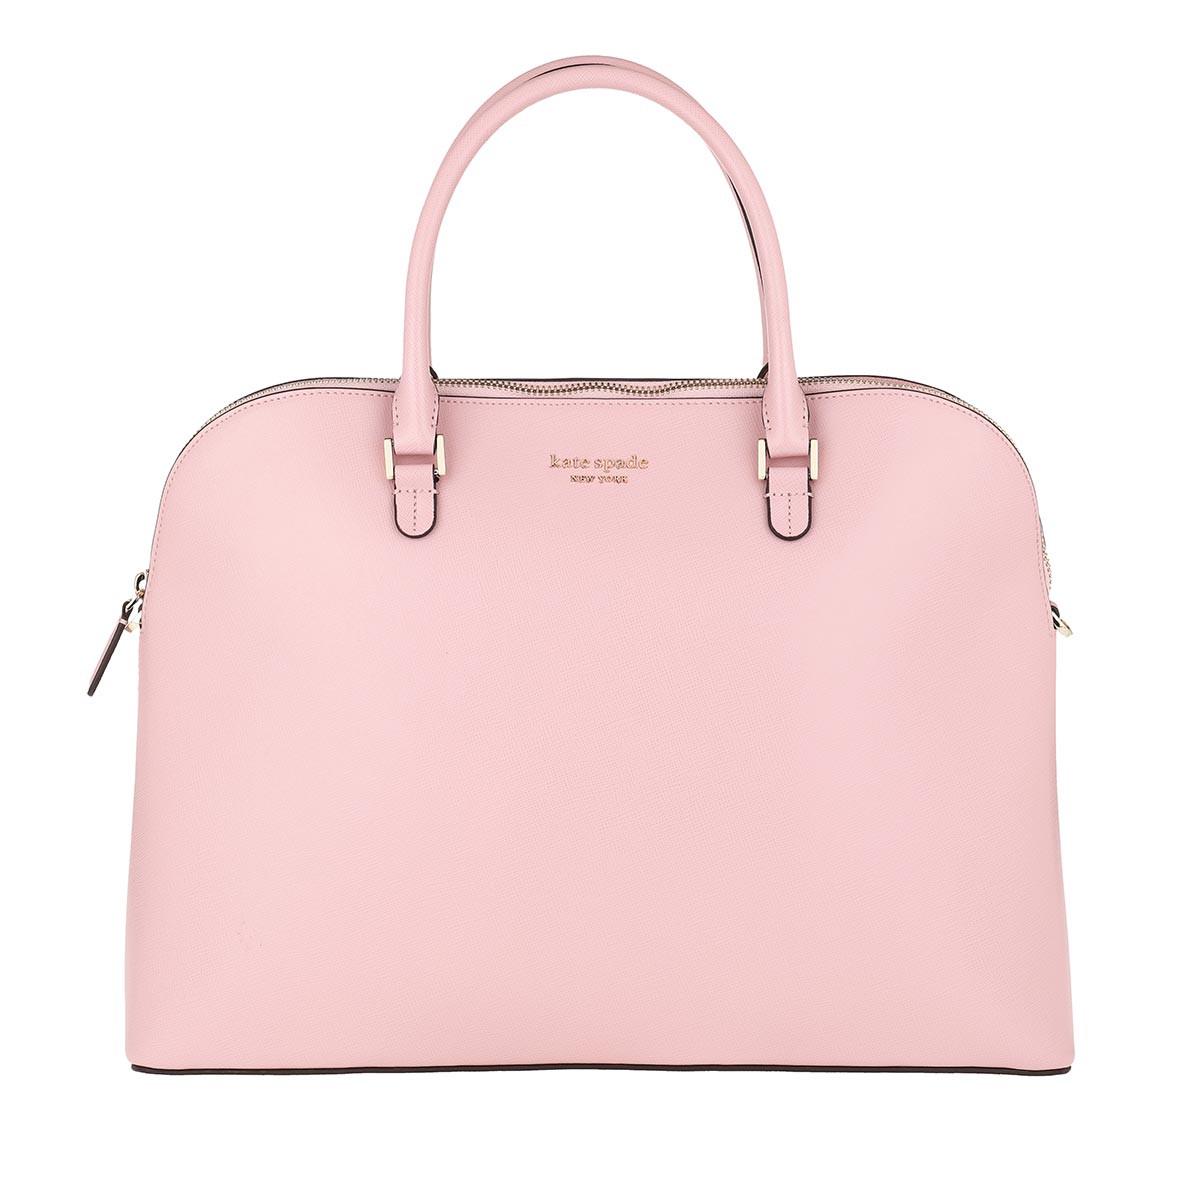 Kate Spade New York Laptoptasche - Spencer Universal Laptop Bag Tutu Pink - in rosa - für Damen